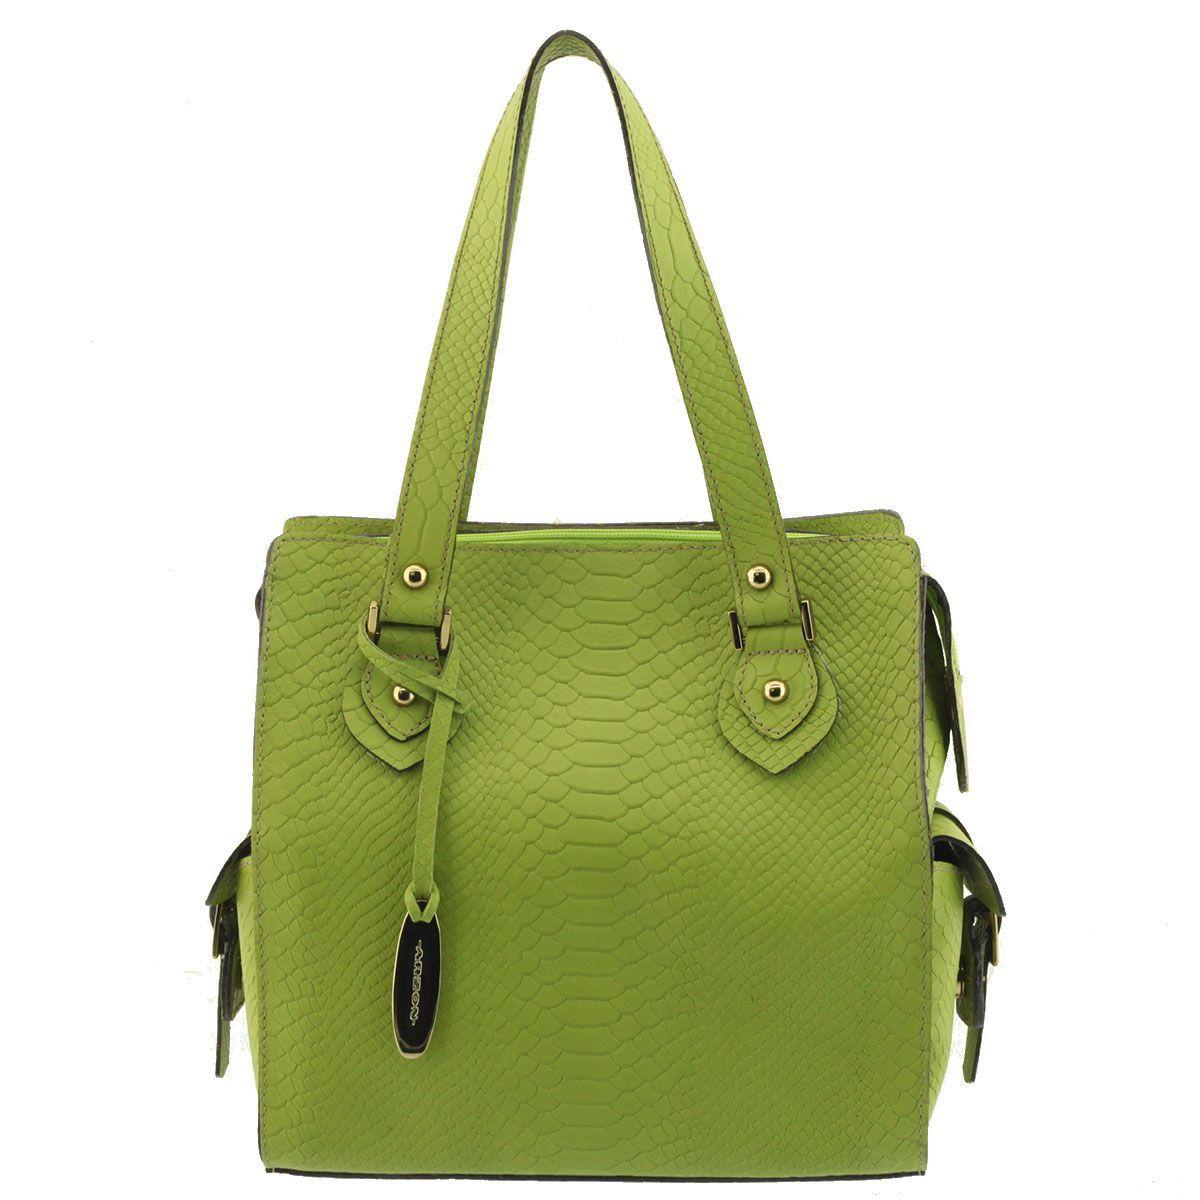 Bolsa Feminina Pequena Couro Verde